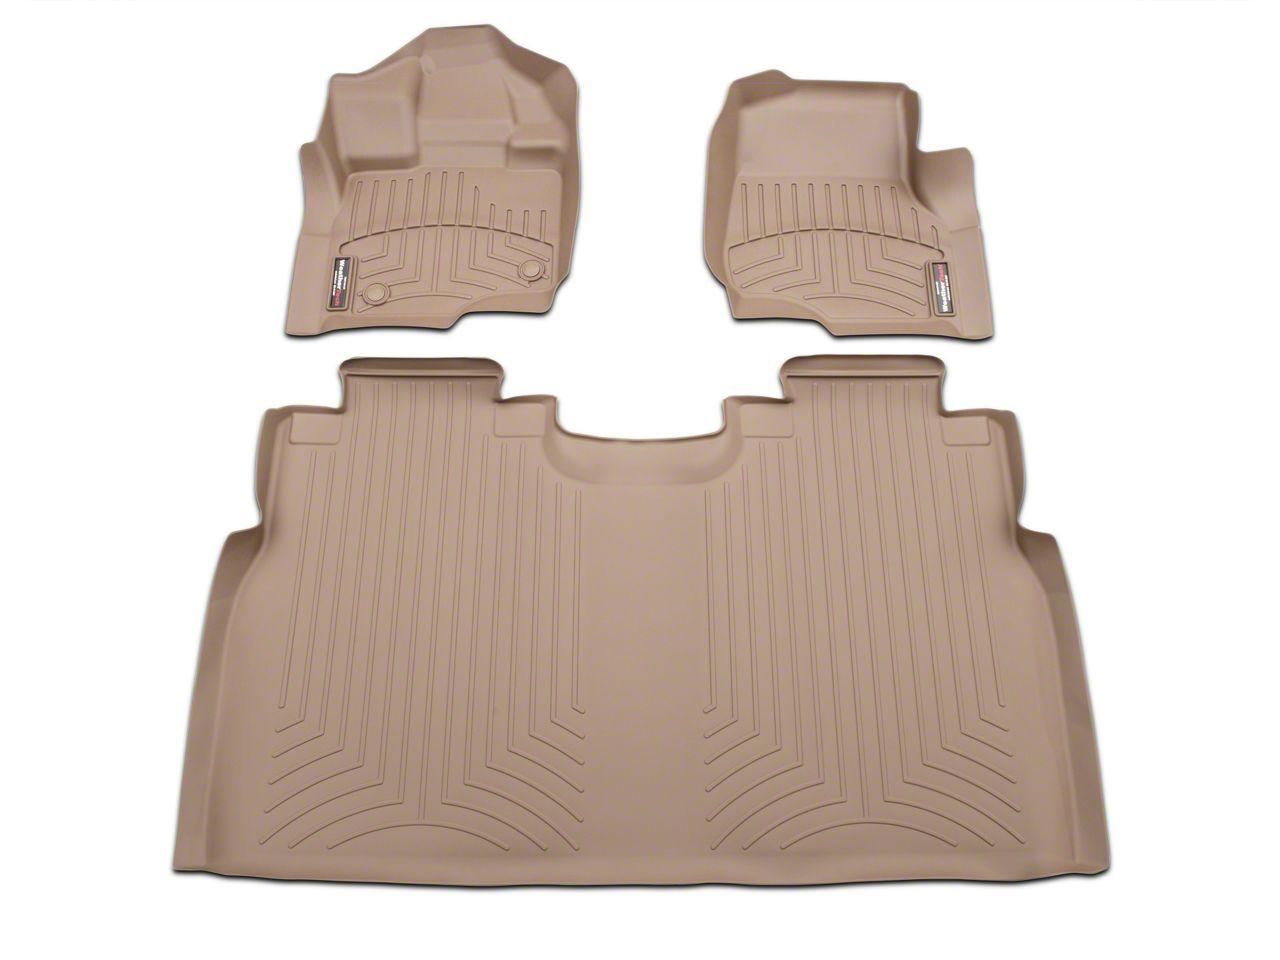 Weathertech DigitalFit Front & Rear Floor Mats - Tan (15-19 F-150 SuperCrew w/ bucket seats)